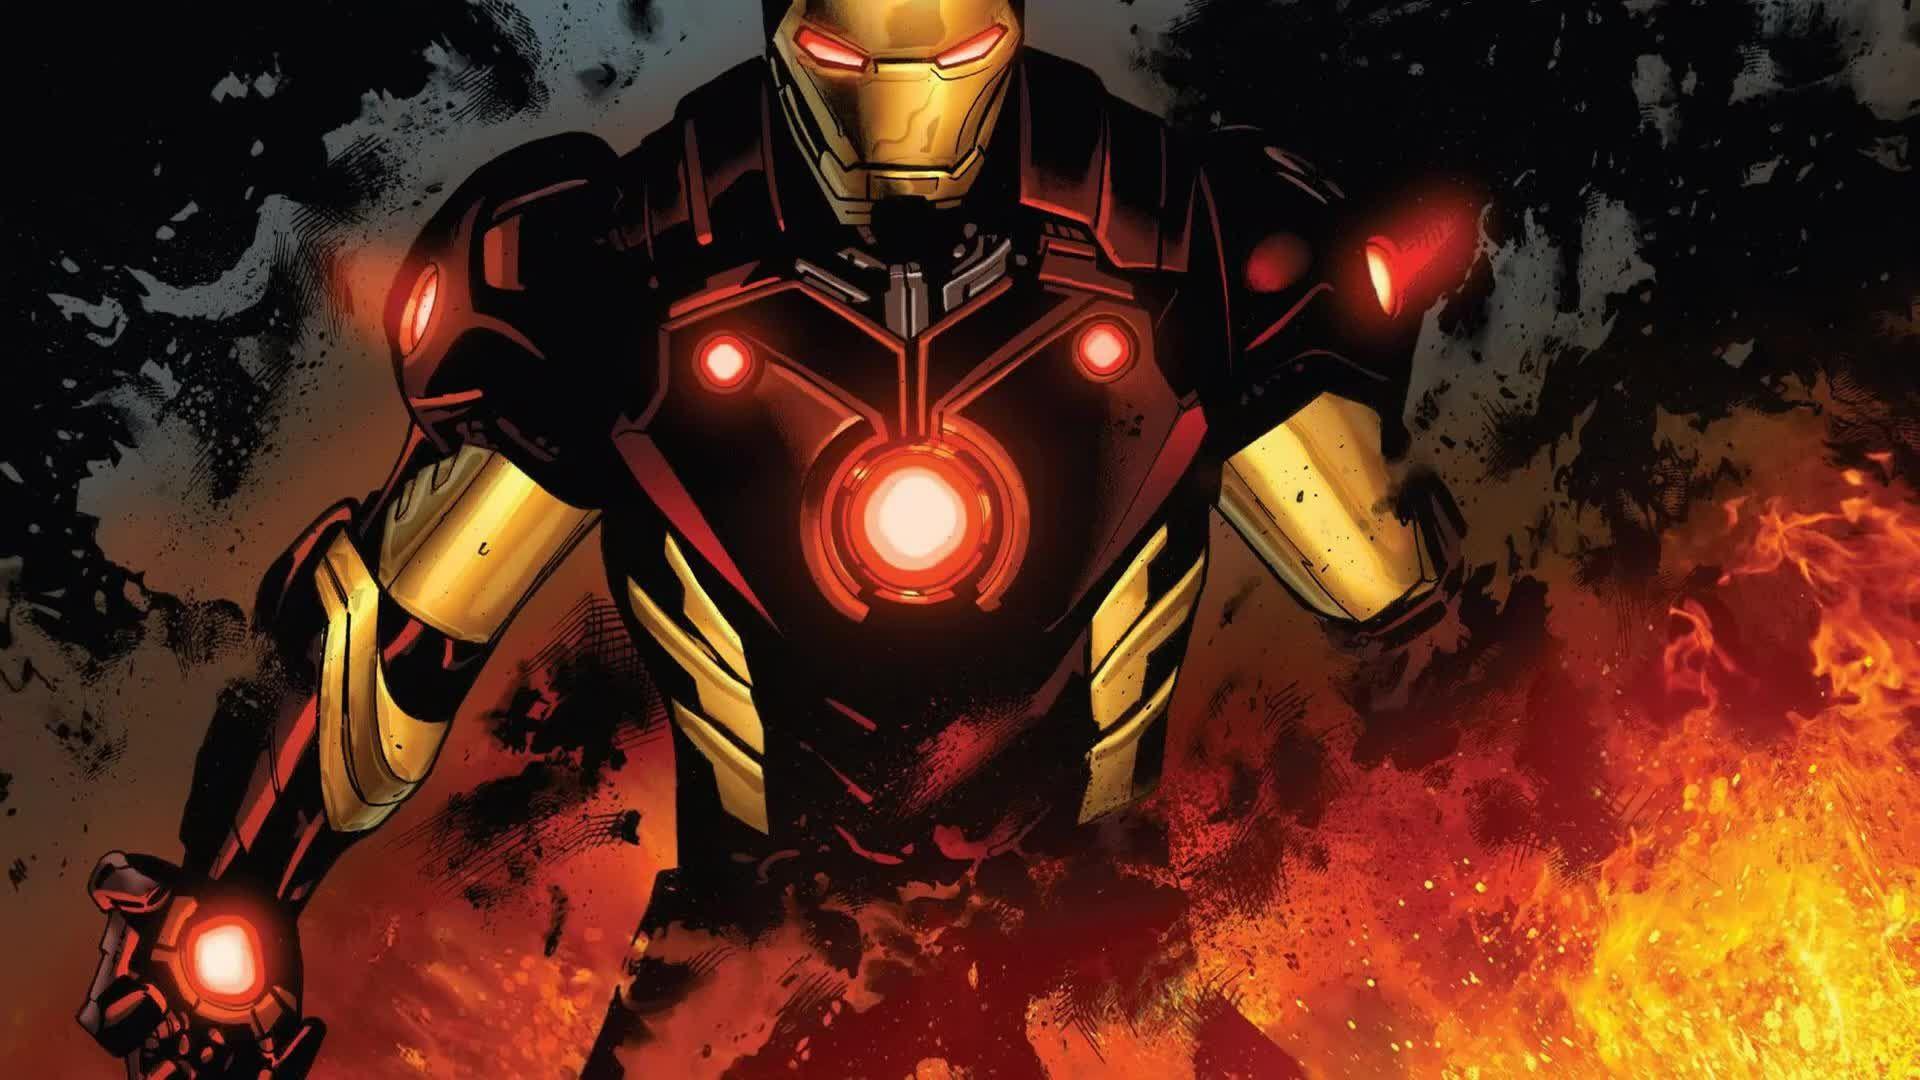 Iron Man Artwork Marvel Dc Comics Live Wallpaper Iron Man Artwork Iron Man Pictures Iron Man Wallpaper